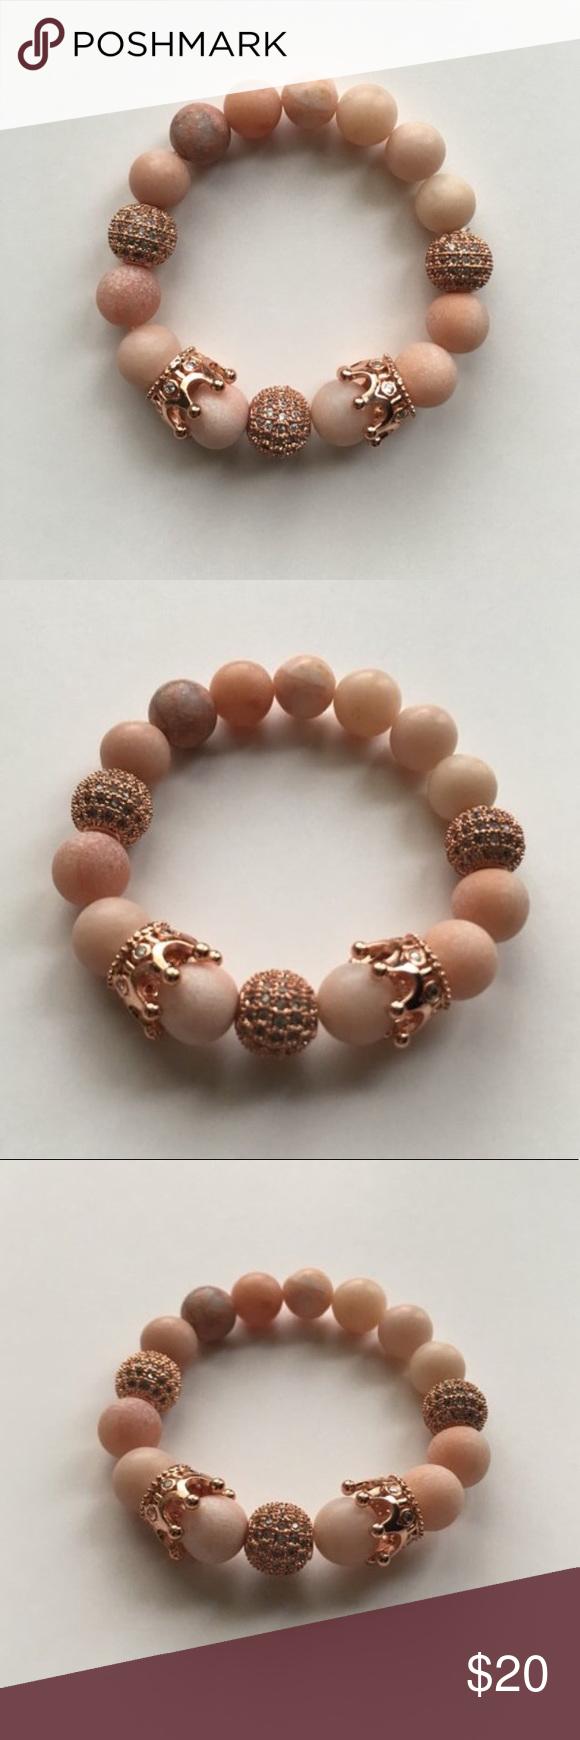 Girls yo yo pink jasper bead bracelet in my posh